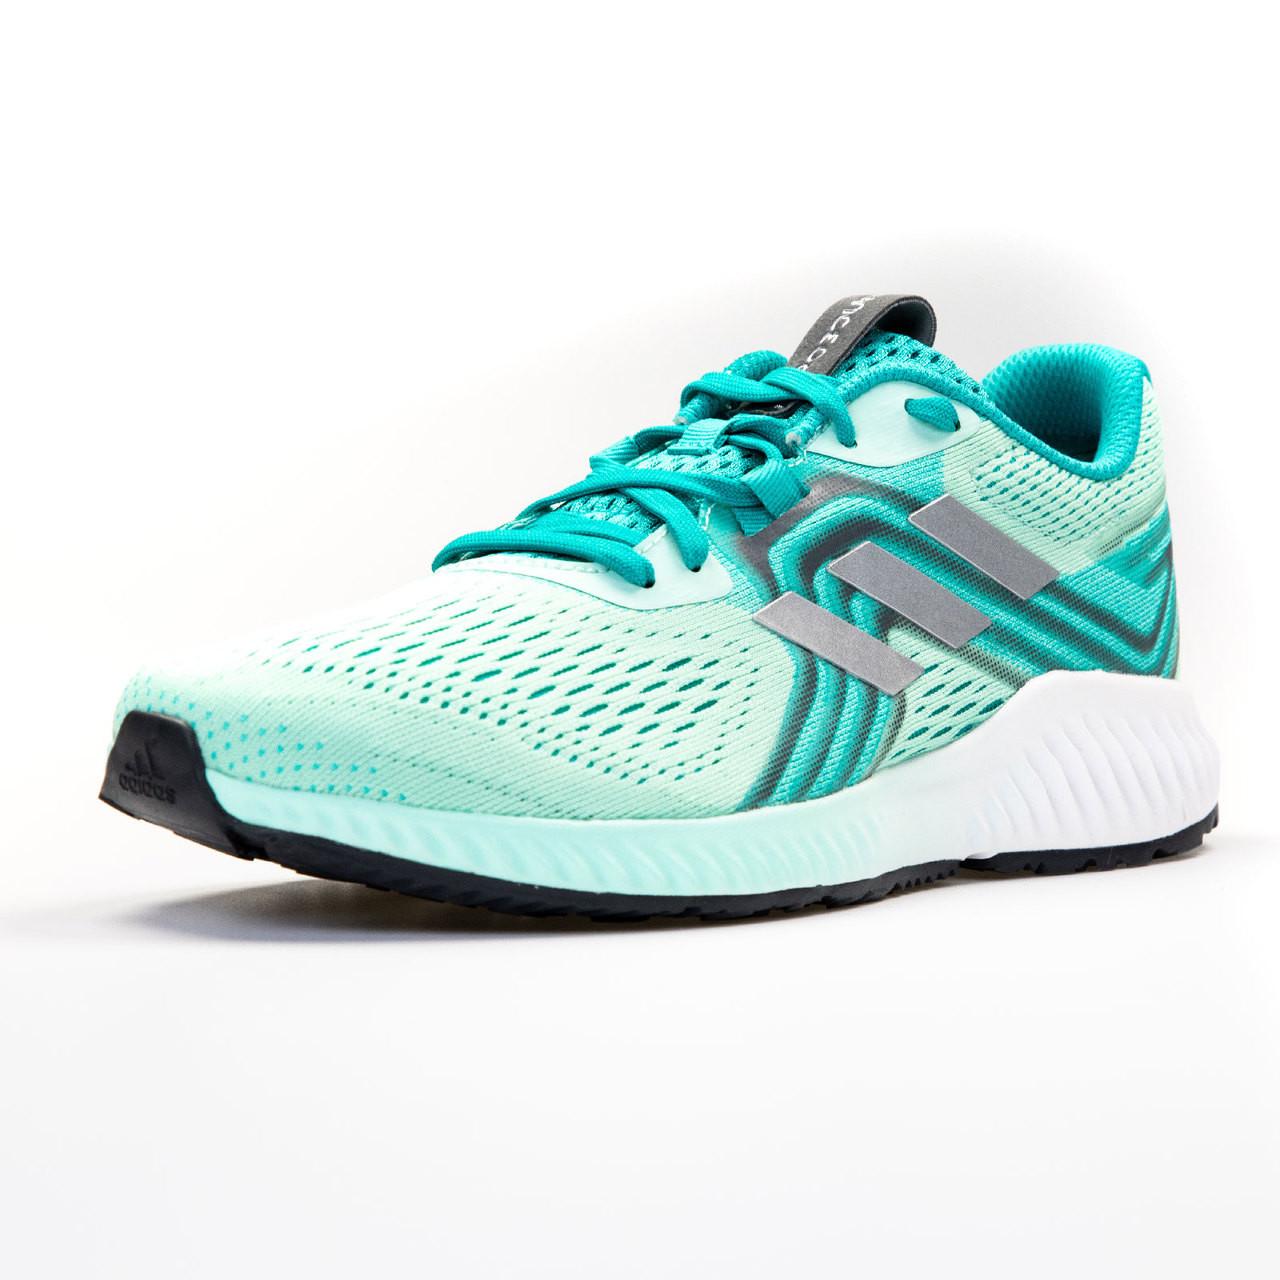 new style 5f4e5 19c8c ... Adidas Aerobounce Womens Sneakers AQ0538 - Aqua, Silver ...